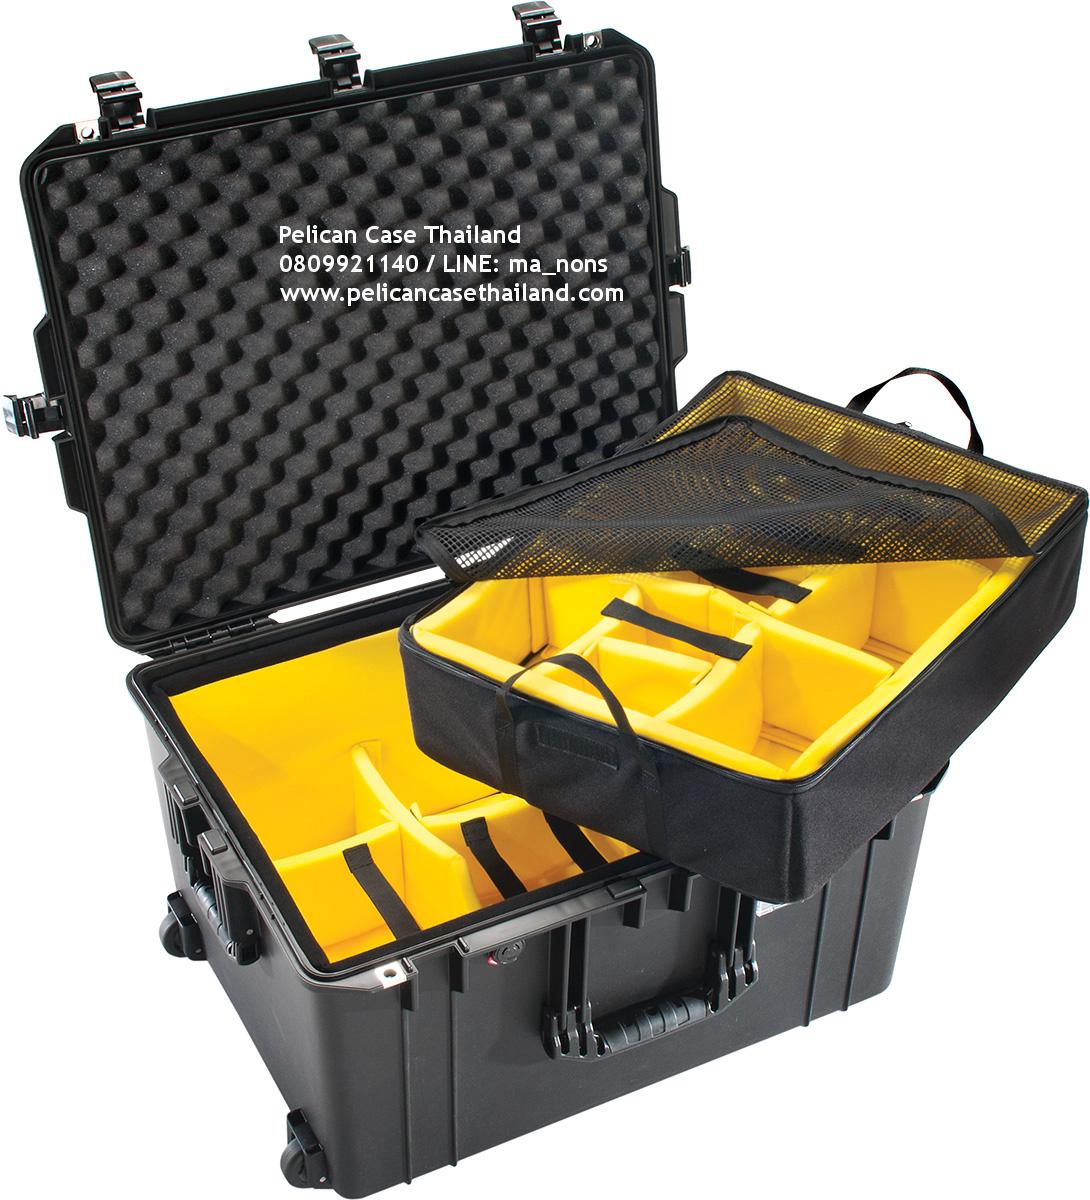 PELICAN™ 1637 AIR with Padded Dividers (ช่องเเท้จากโรงงาน USA)